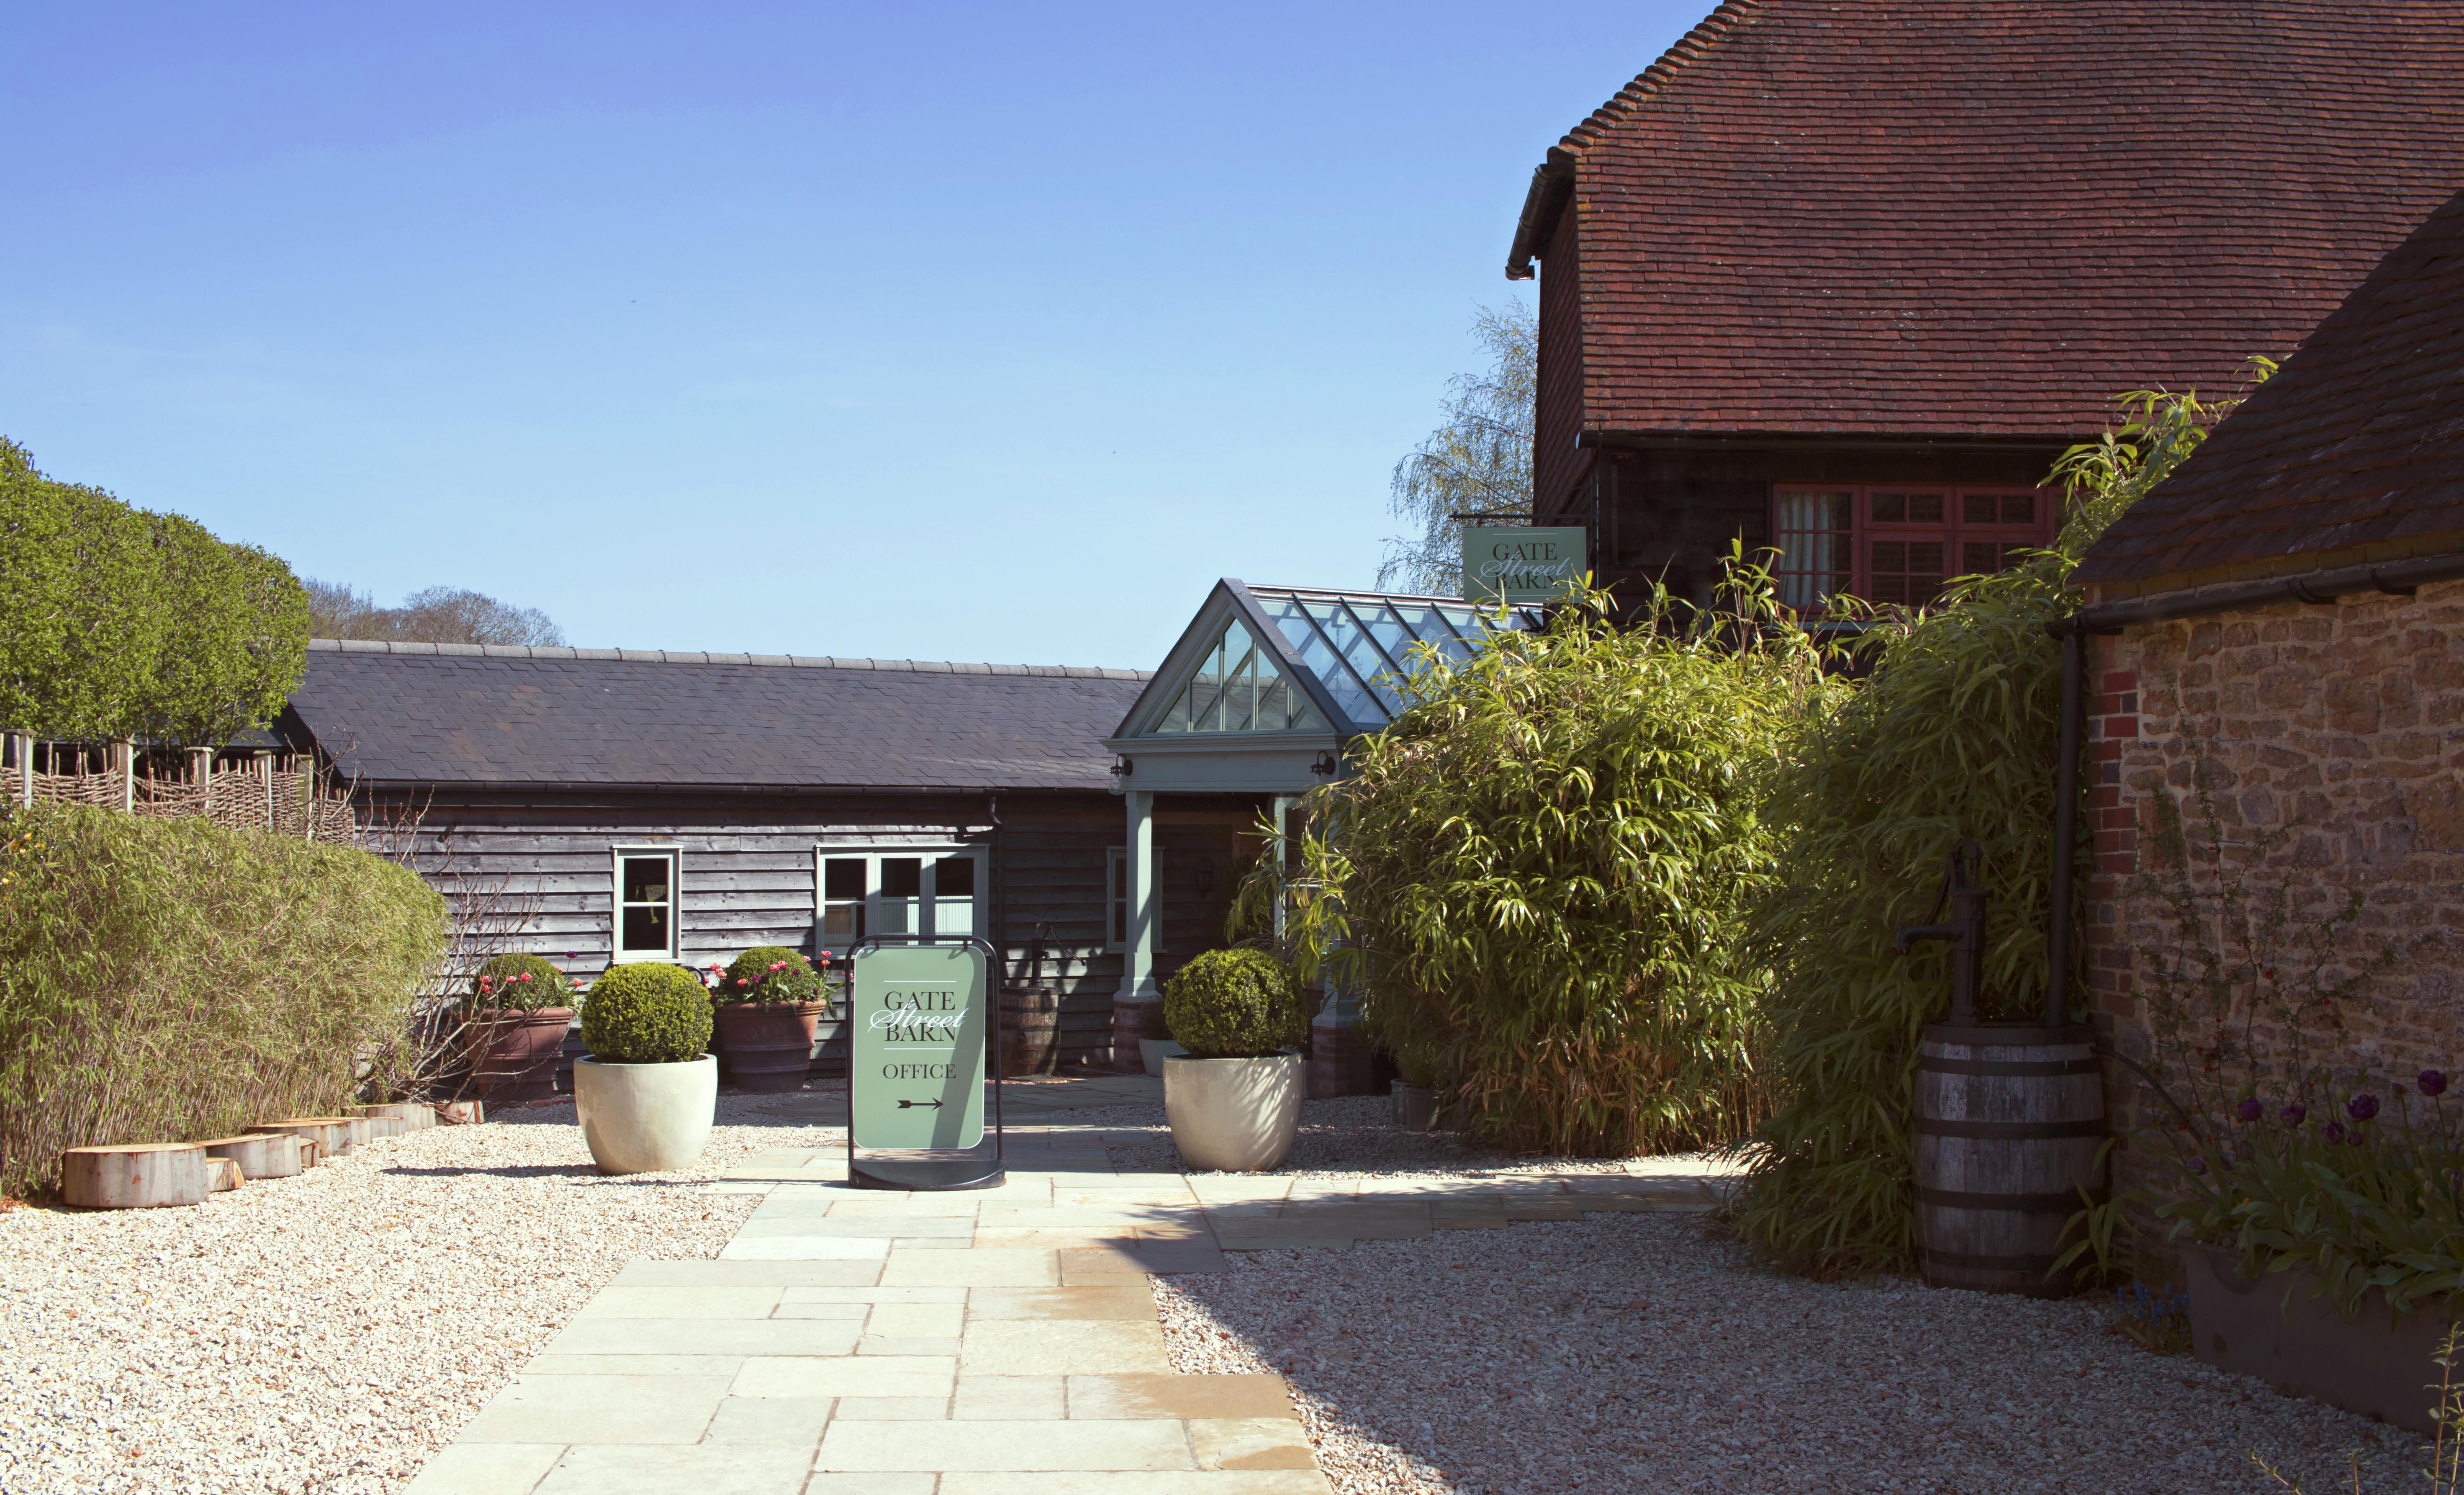 Gate Street Barn, in Surrey, Enterance